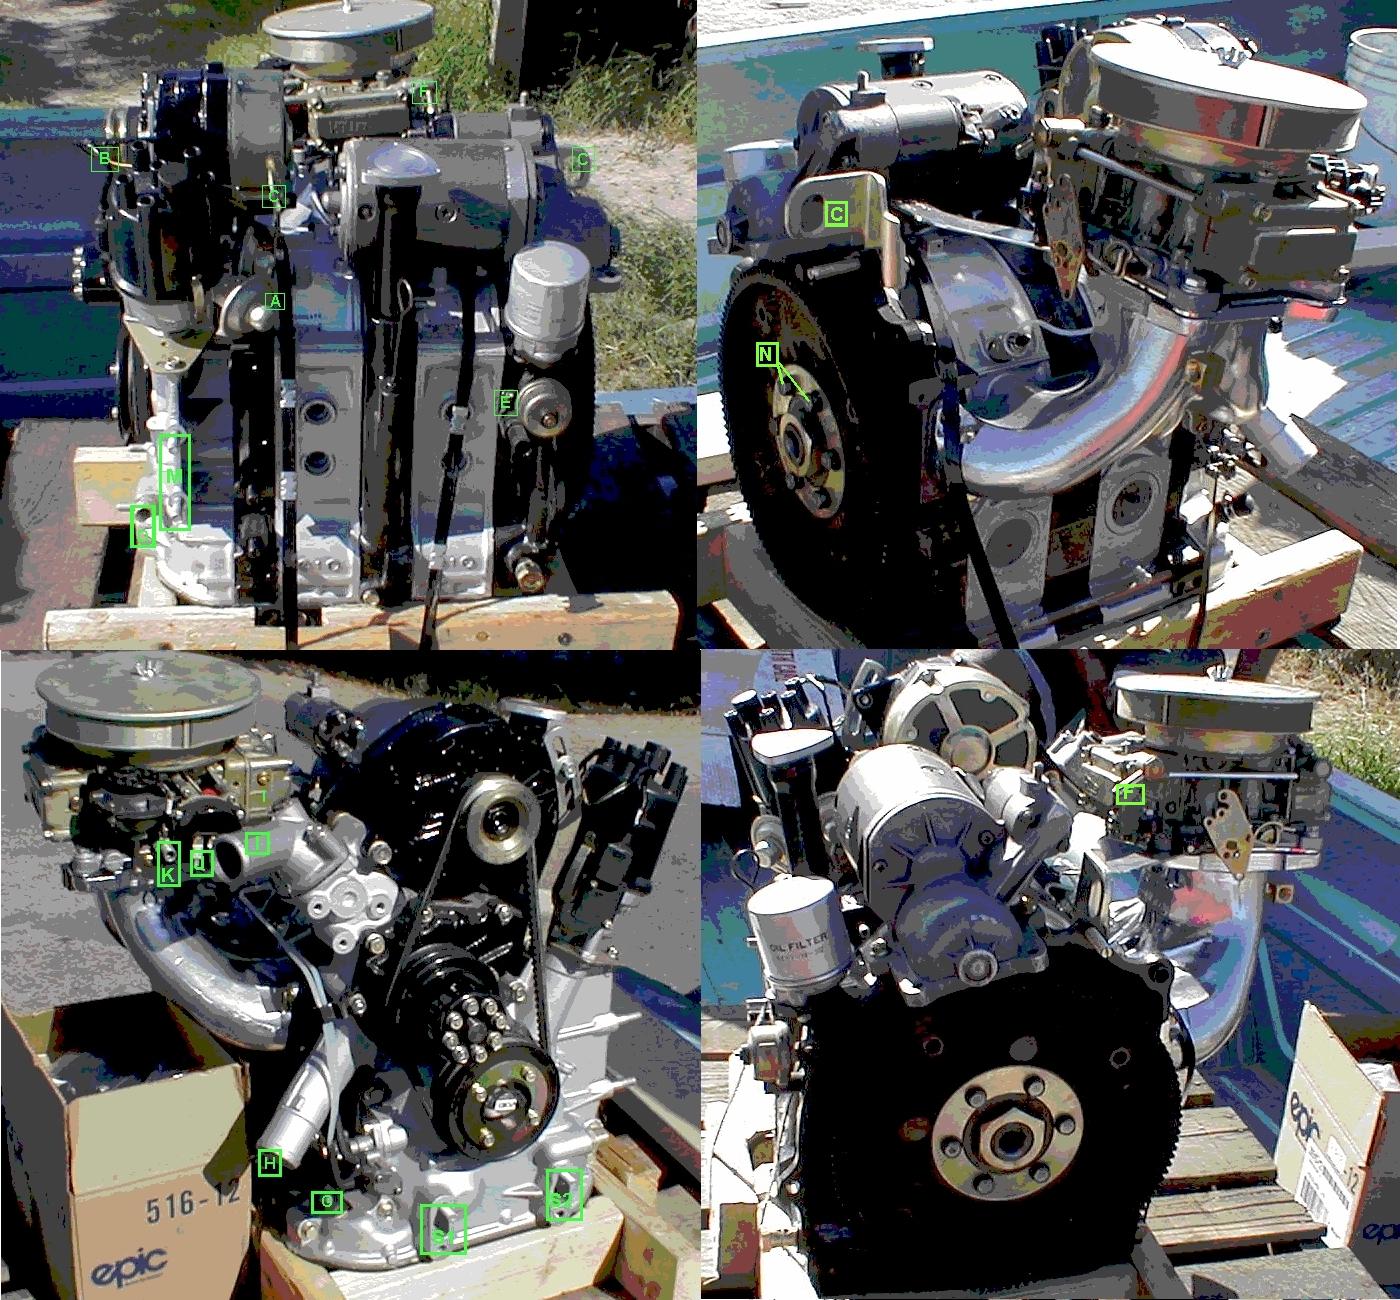 Mazda 13b Rotary Engine: 4wings.com (956) 943-5150